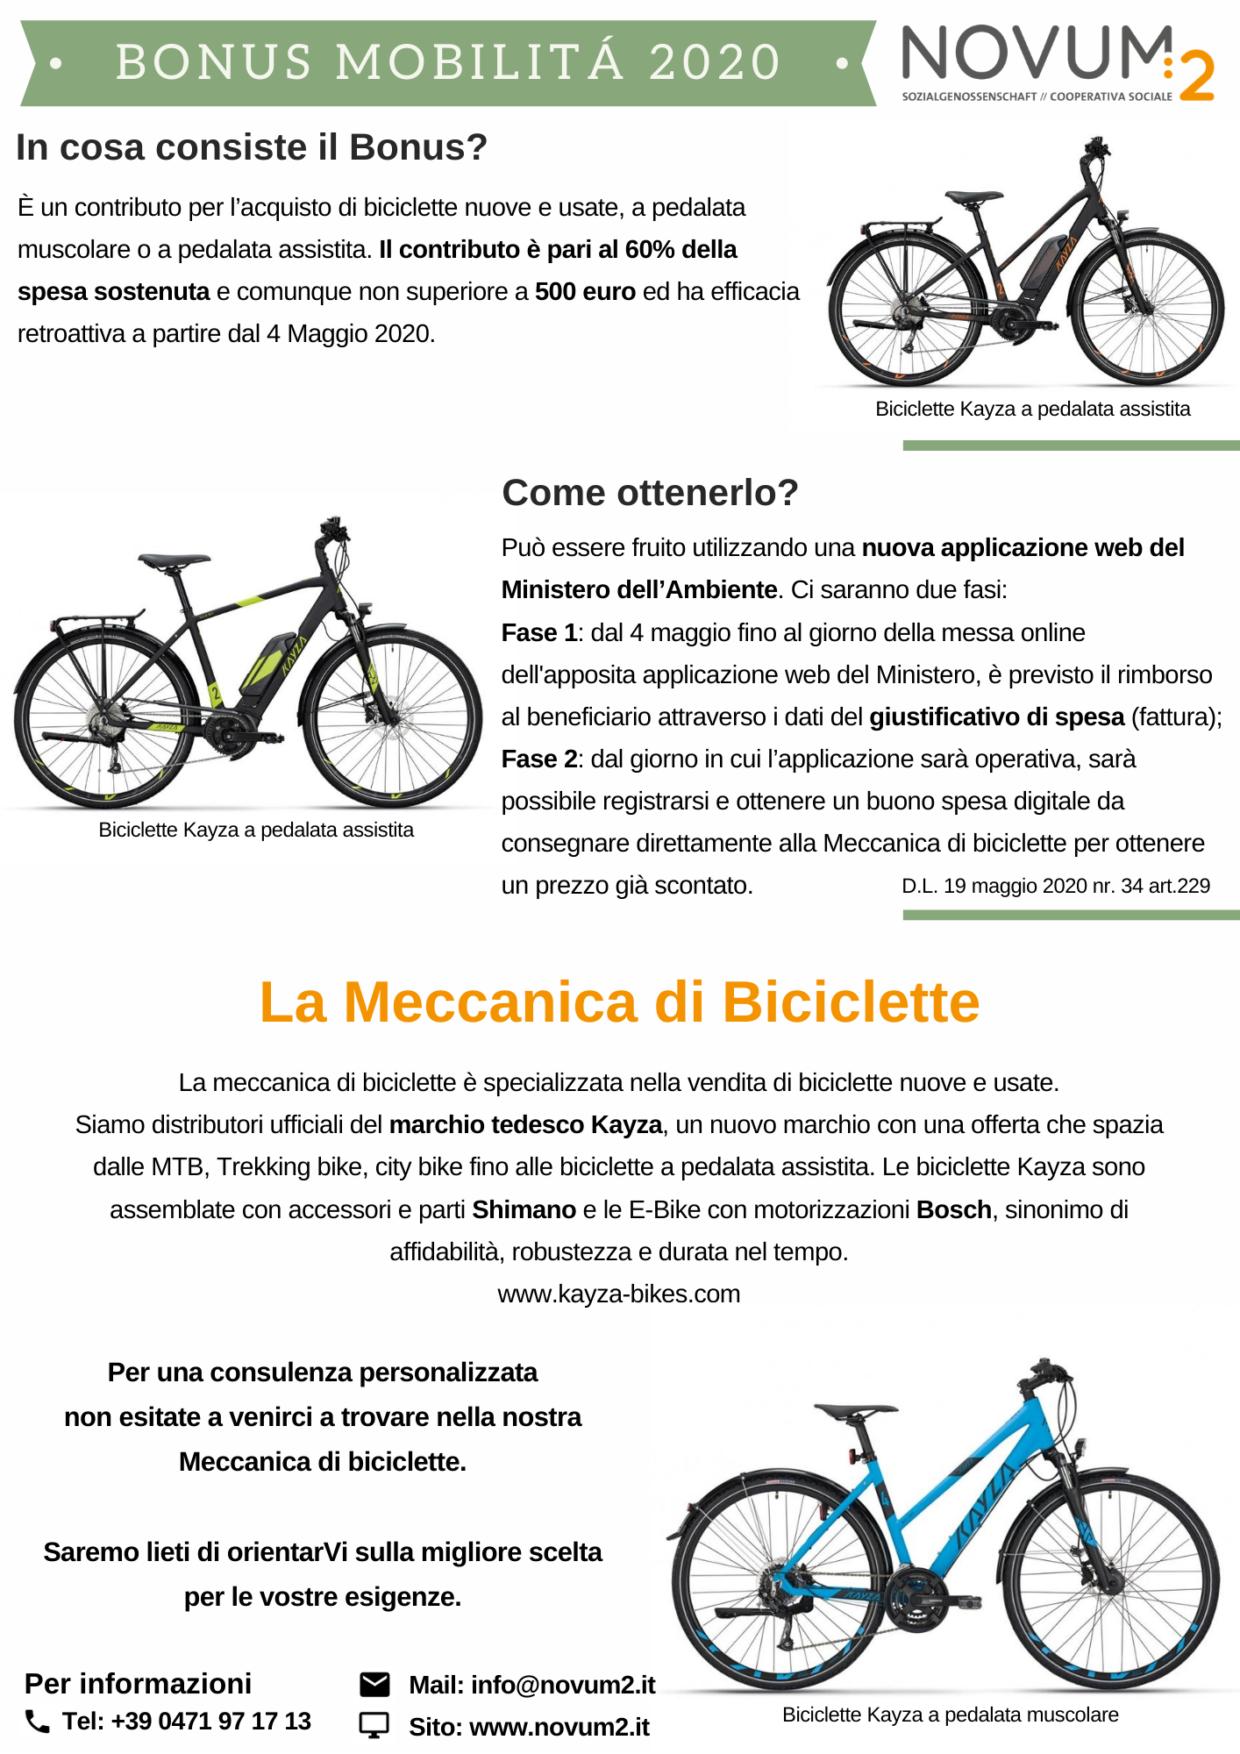 Bonus Mobilità_Meccanica Biciclette Novum2